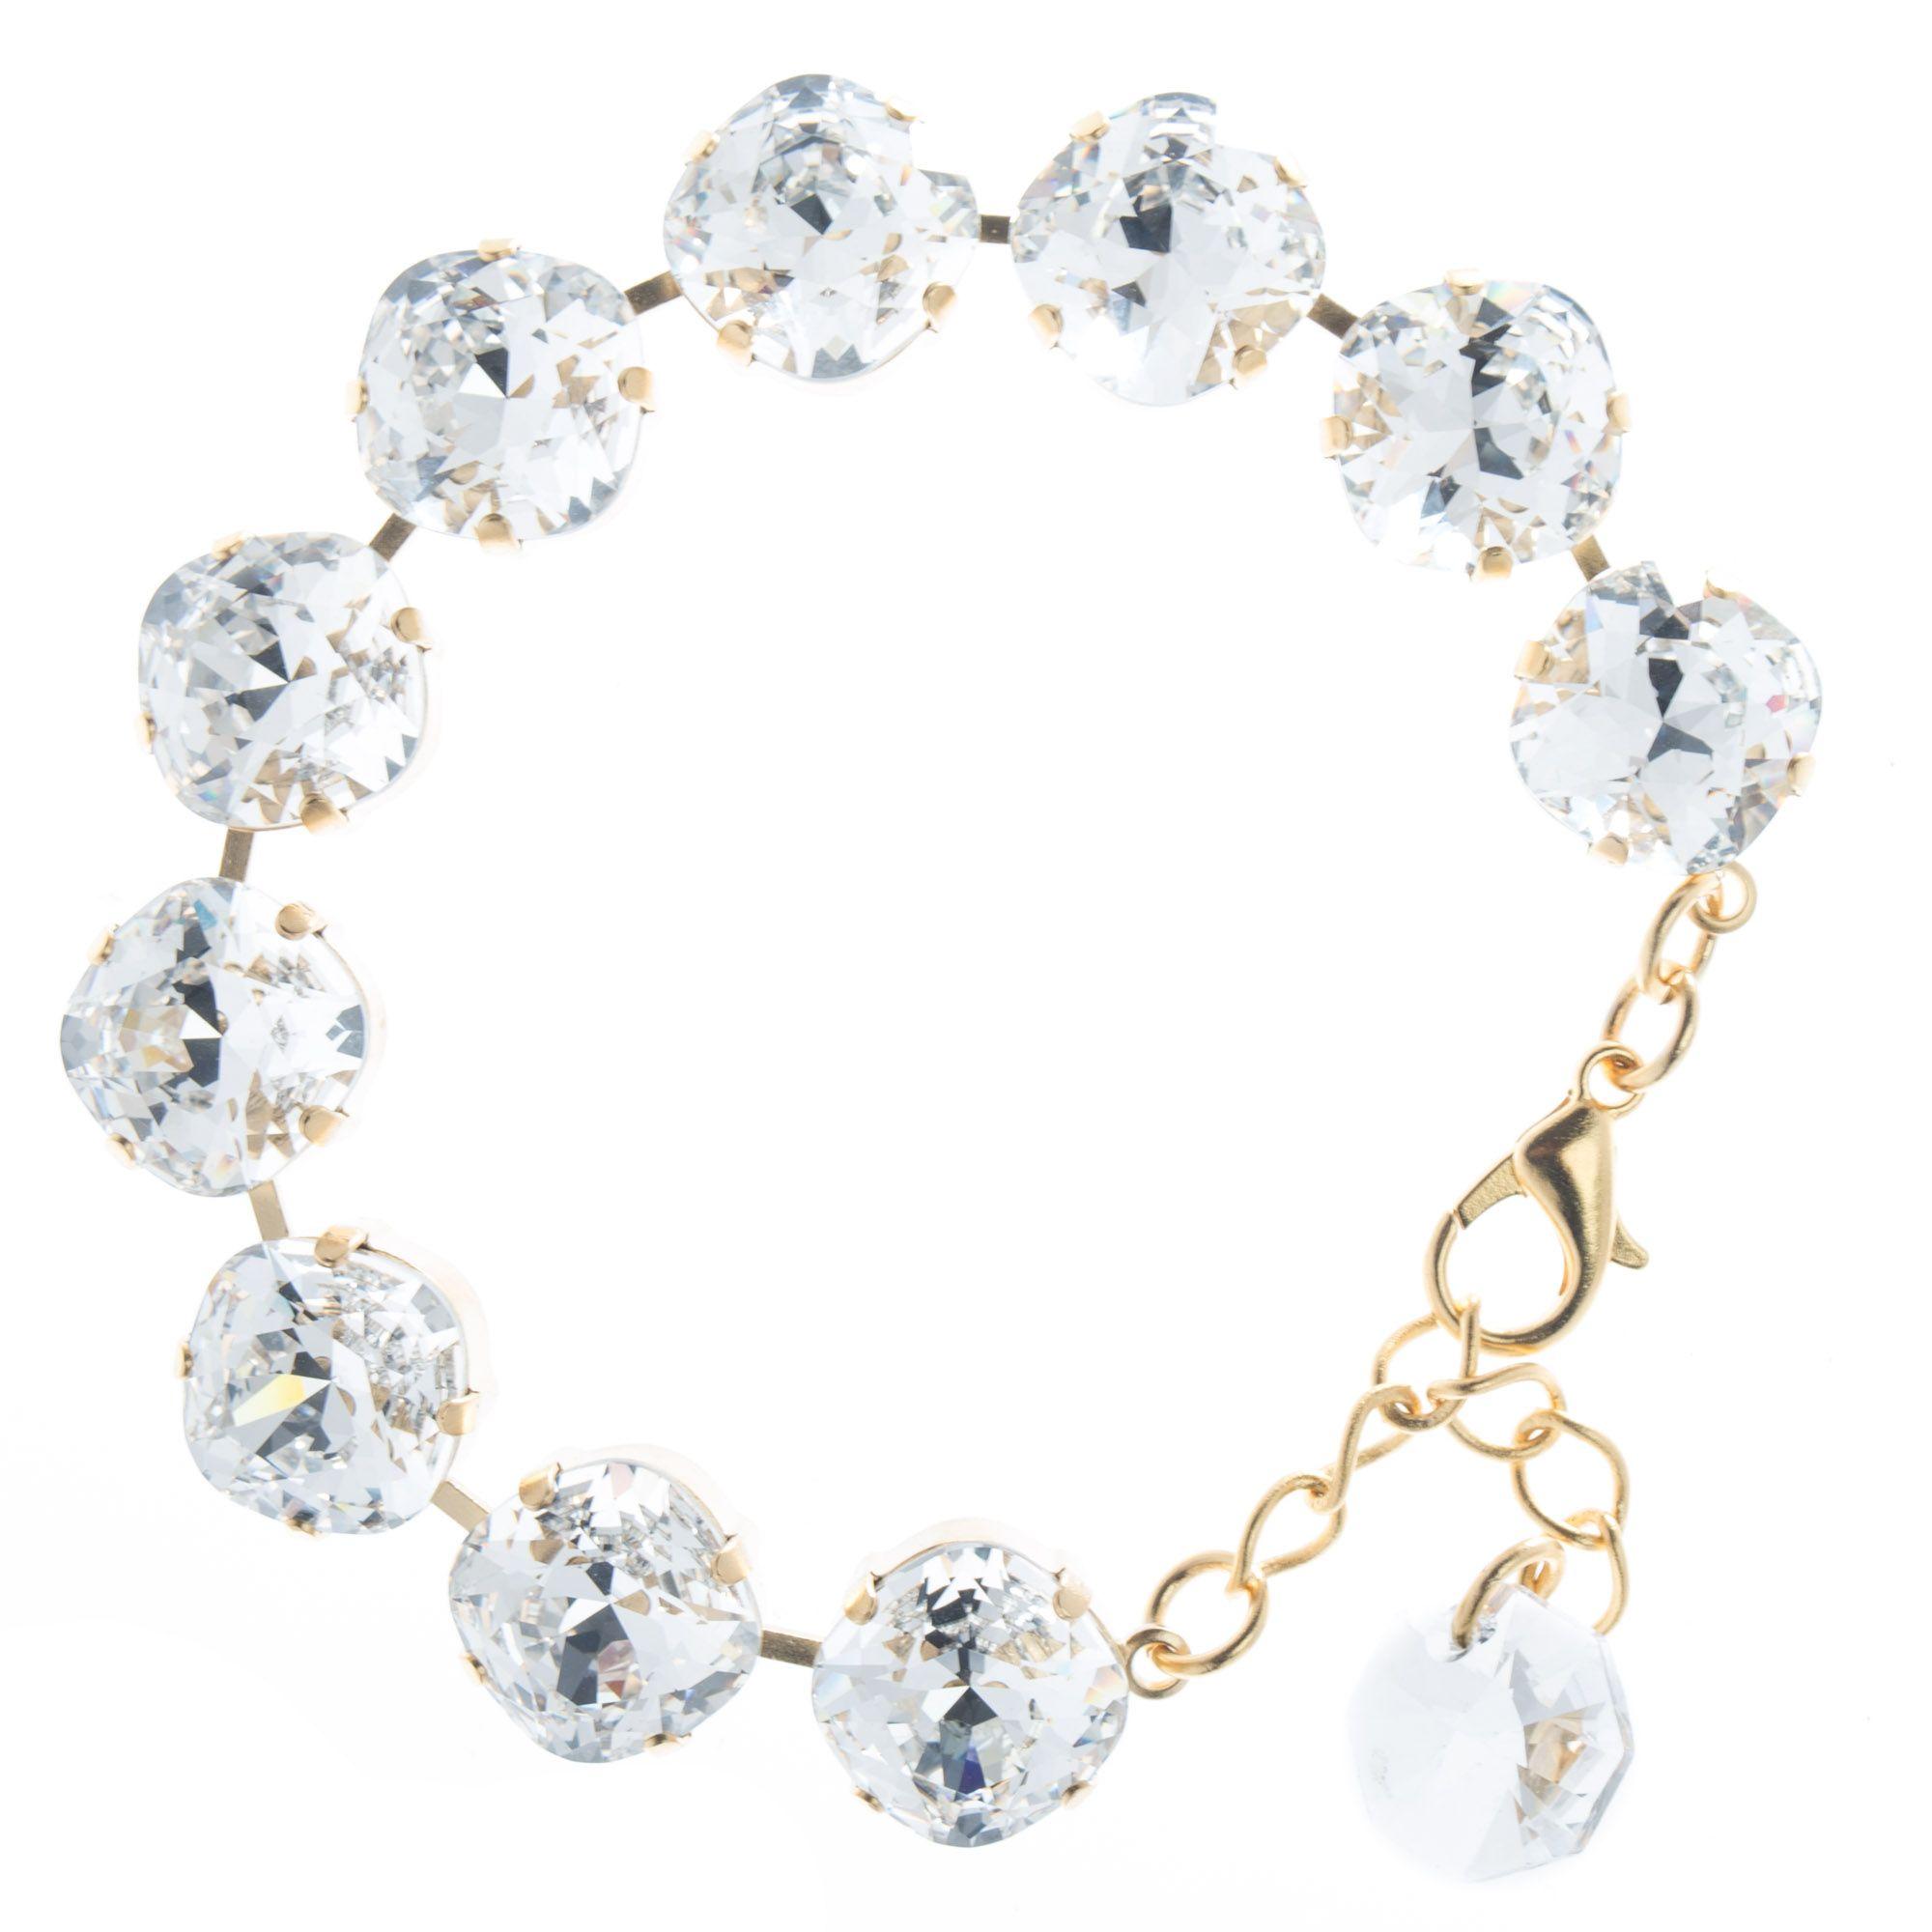 Lisa Marie Jewelry 12mm Square Swarovski Crystal Bracelet - Clear